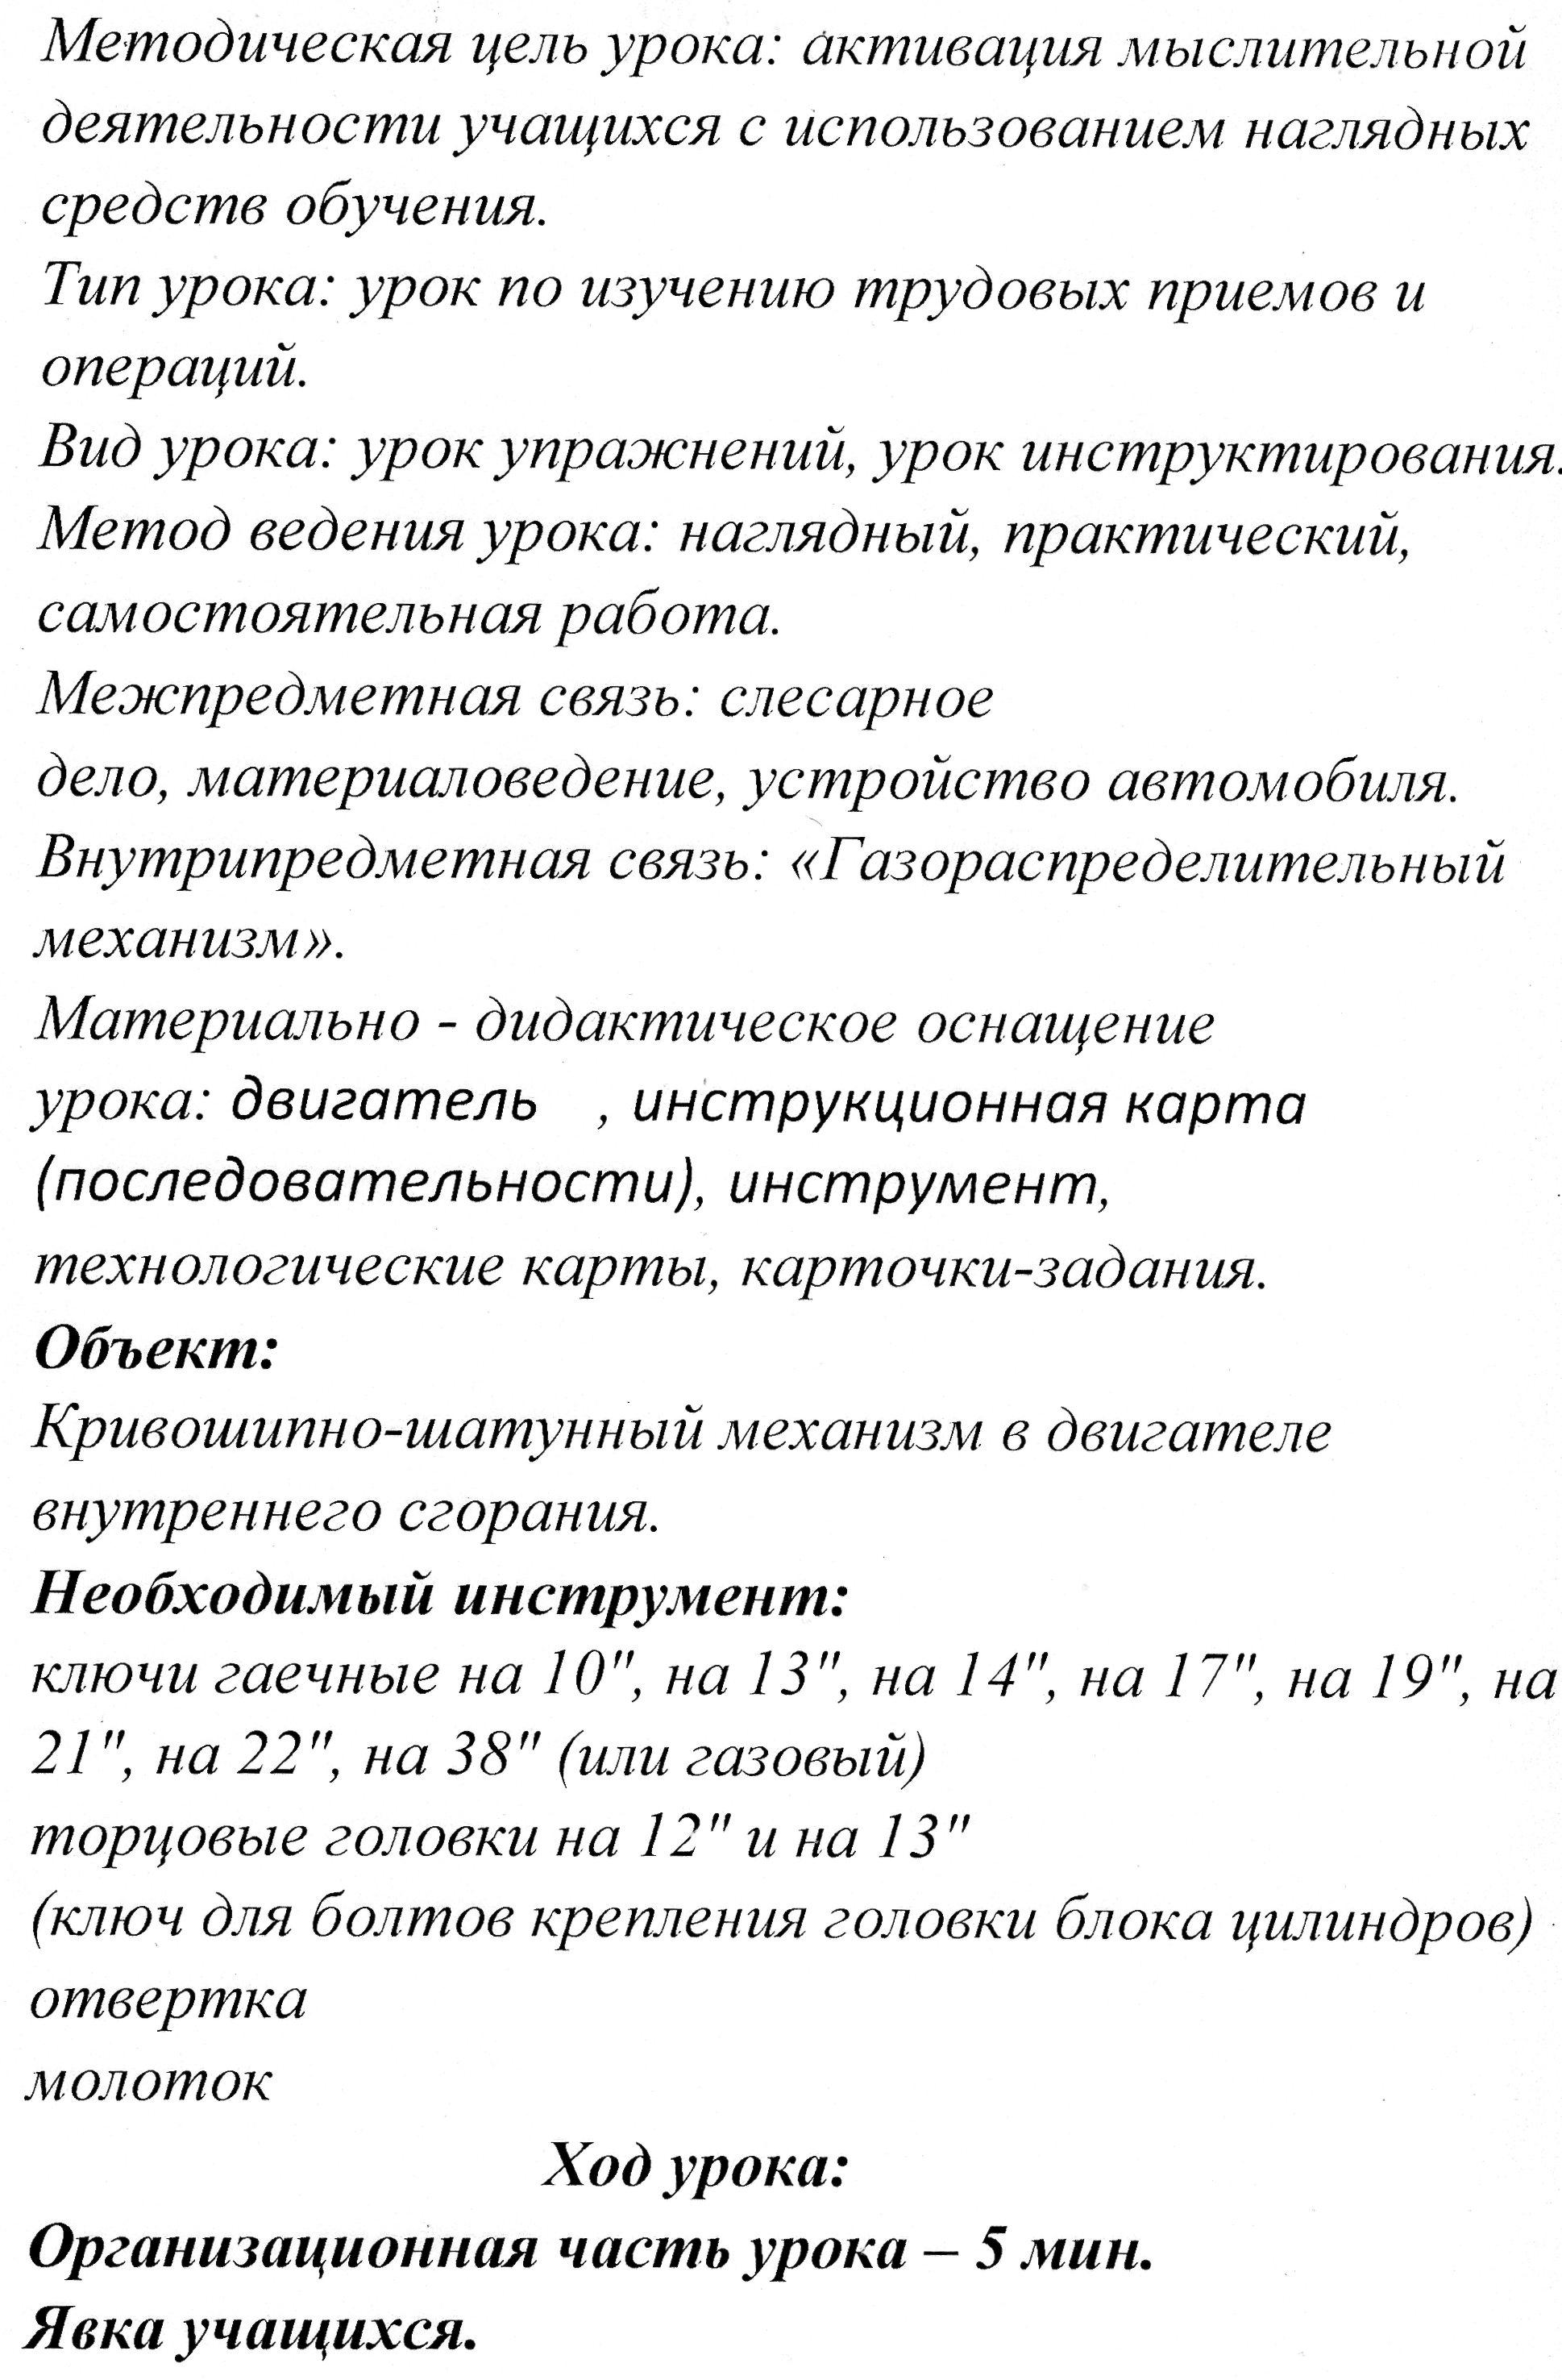 C:\Users\Василий Мельченко\Pictures\img578.jpg